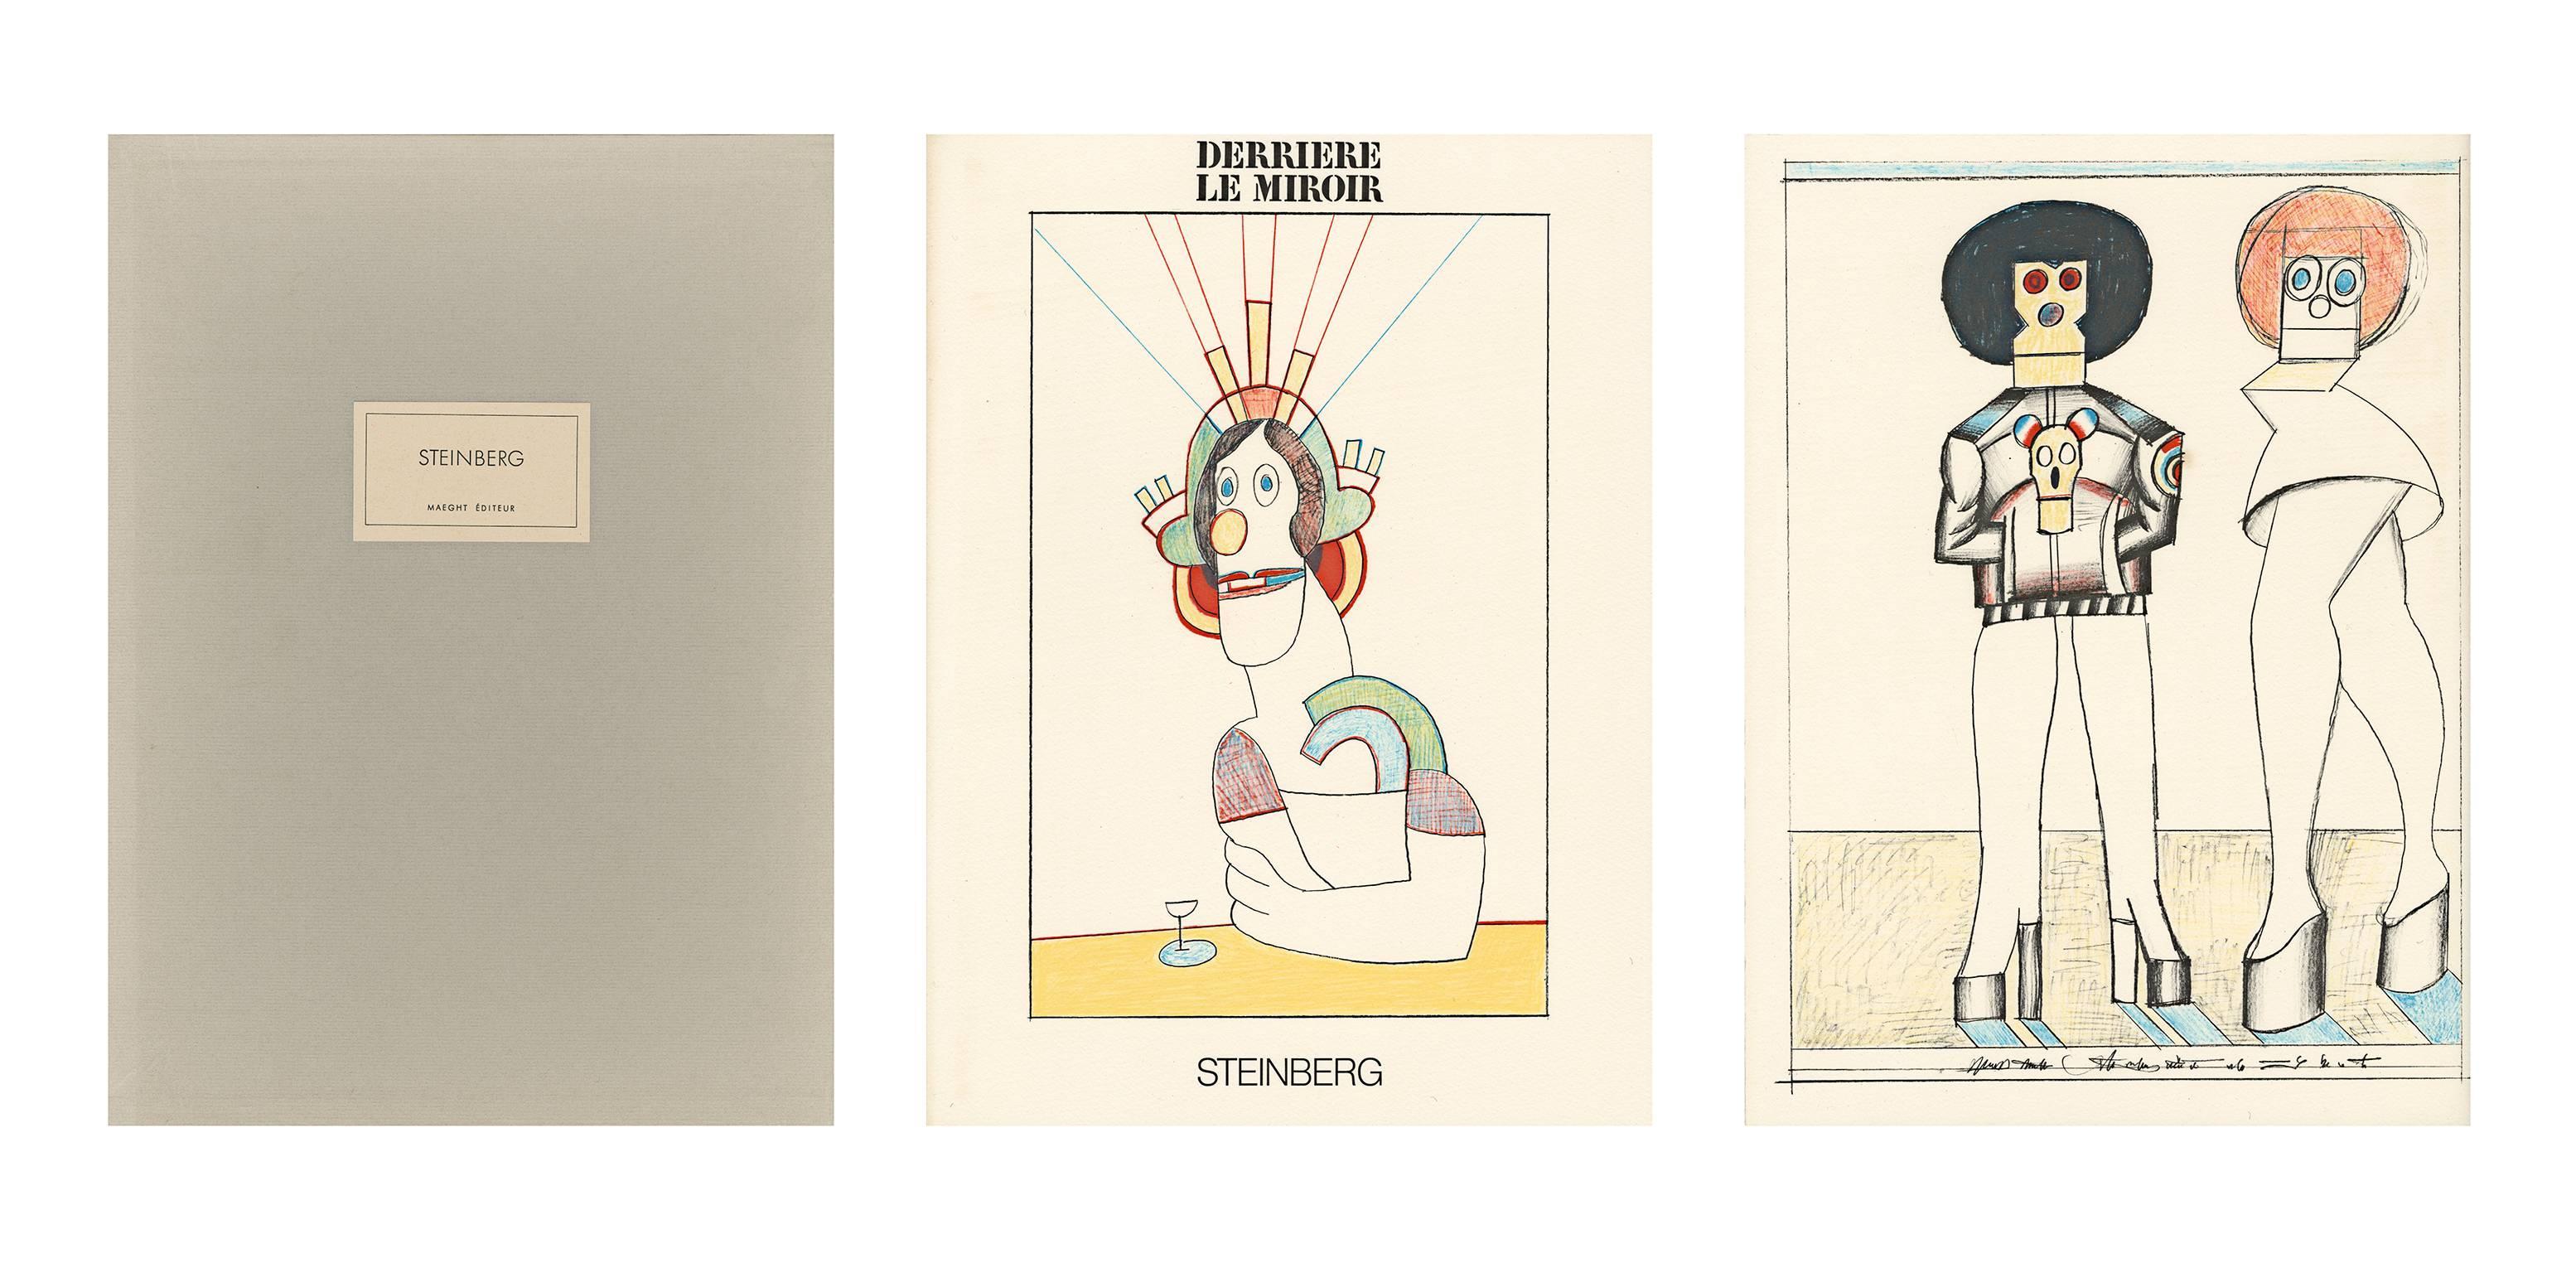 Saul Steinberg Art - 11 For Sale at 1stdibs